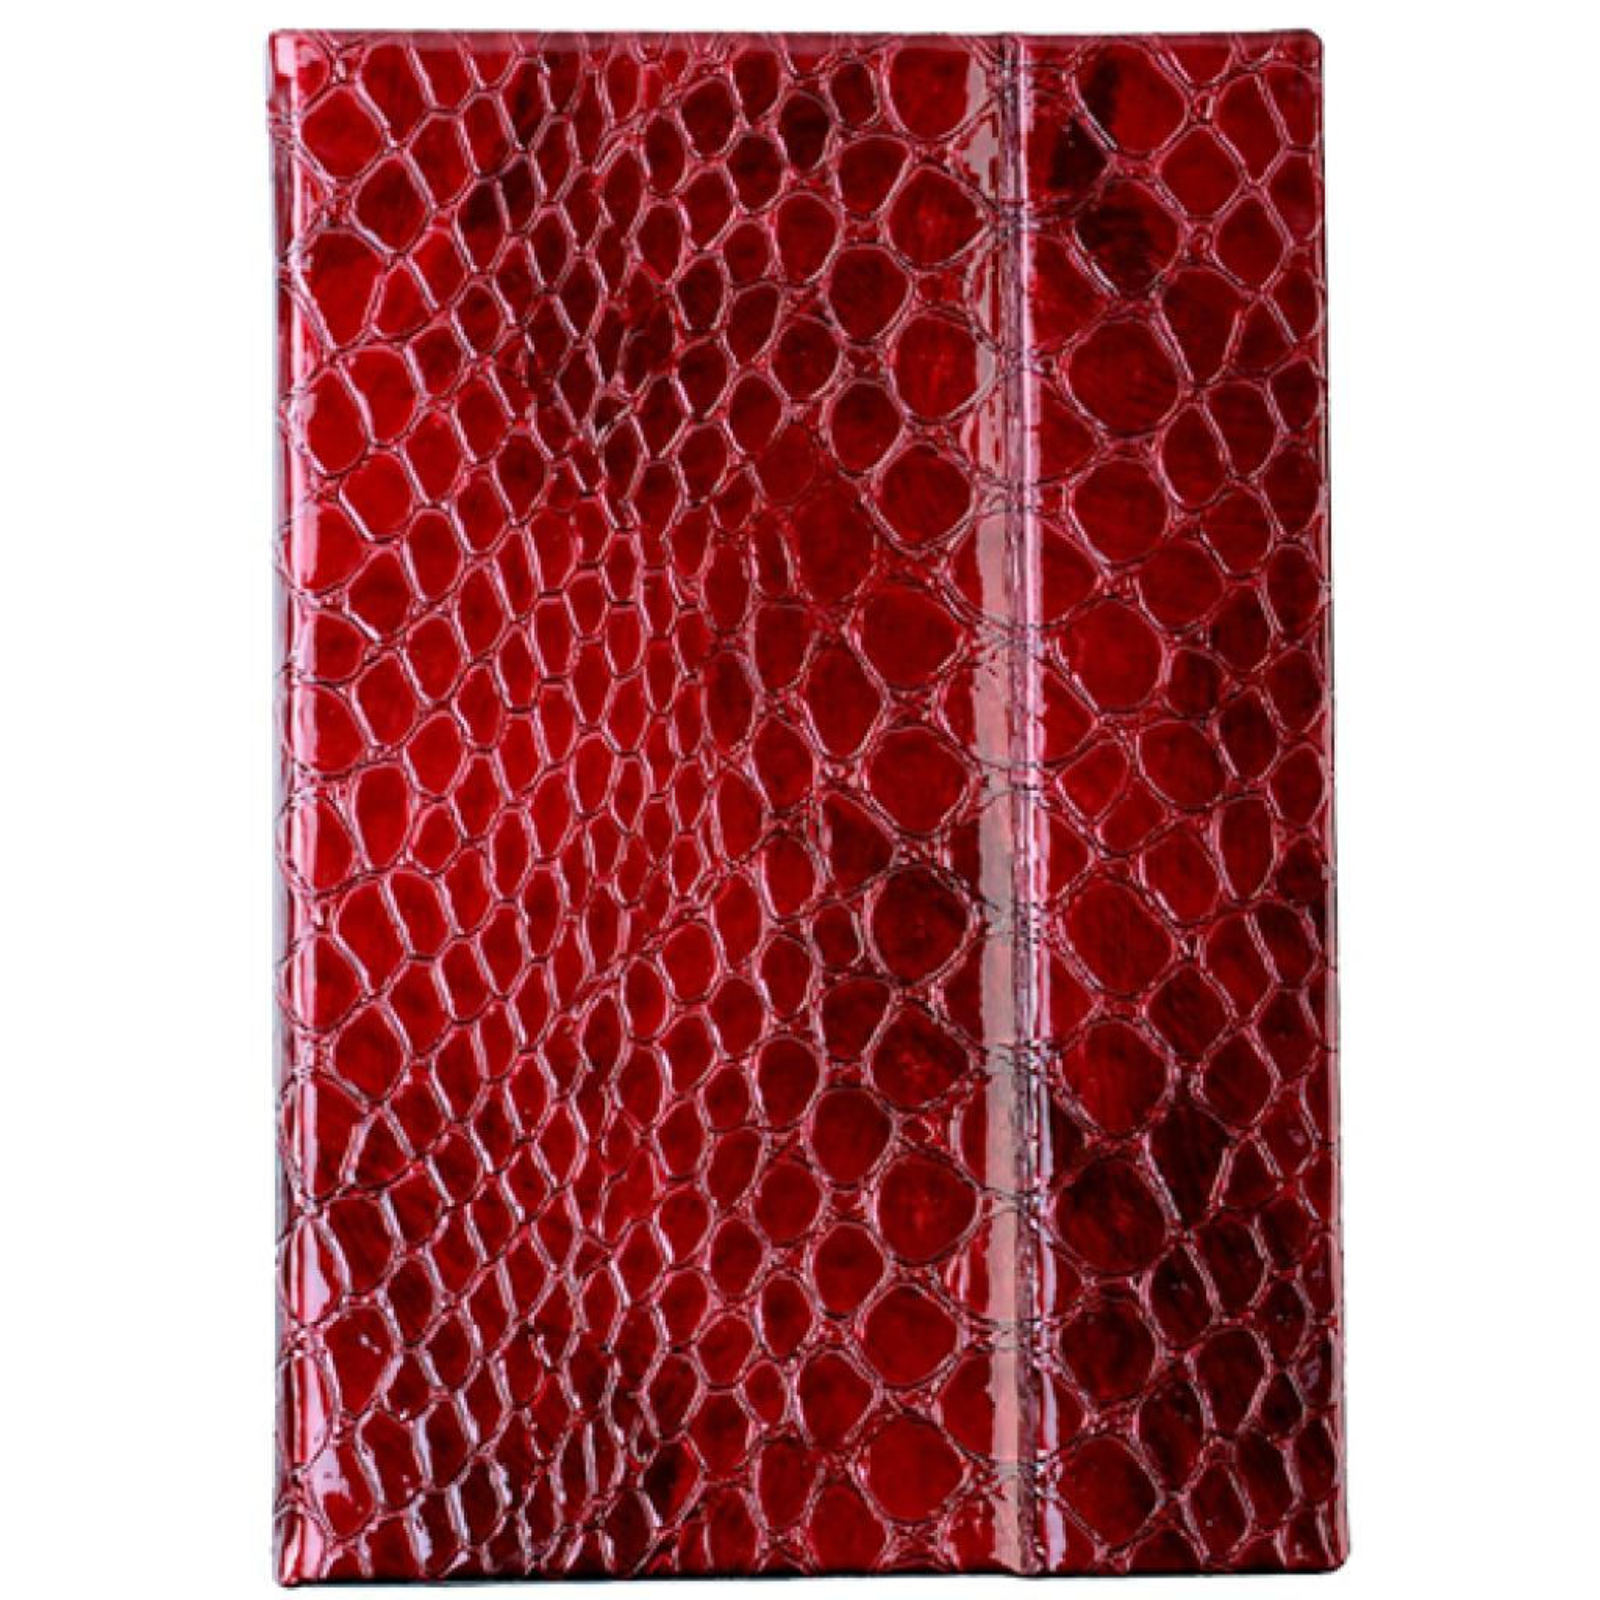 Чехол для планшета Vento 7 Desire glossy - red reptile изображение 2